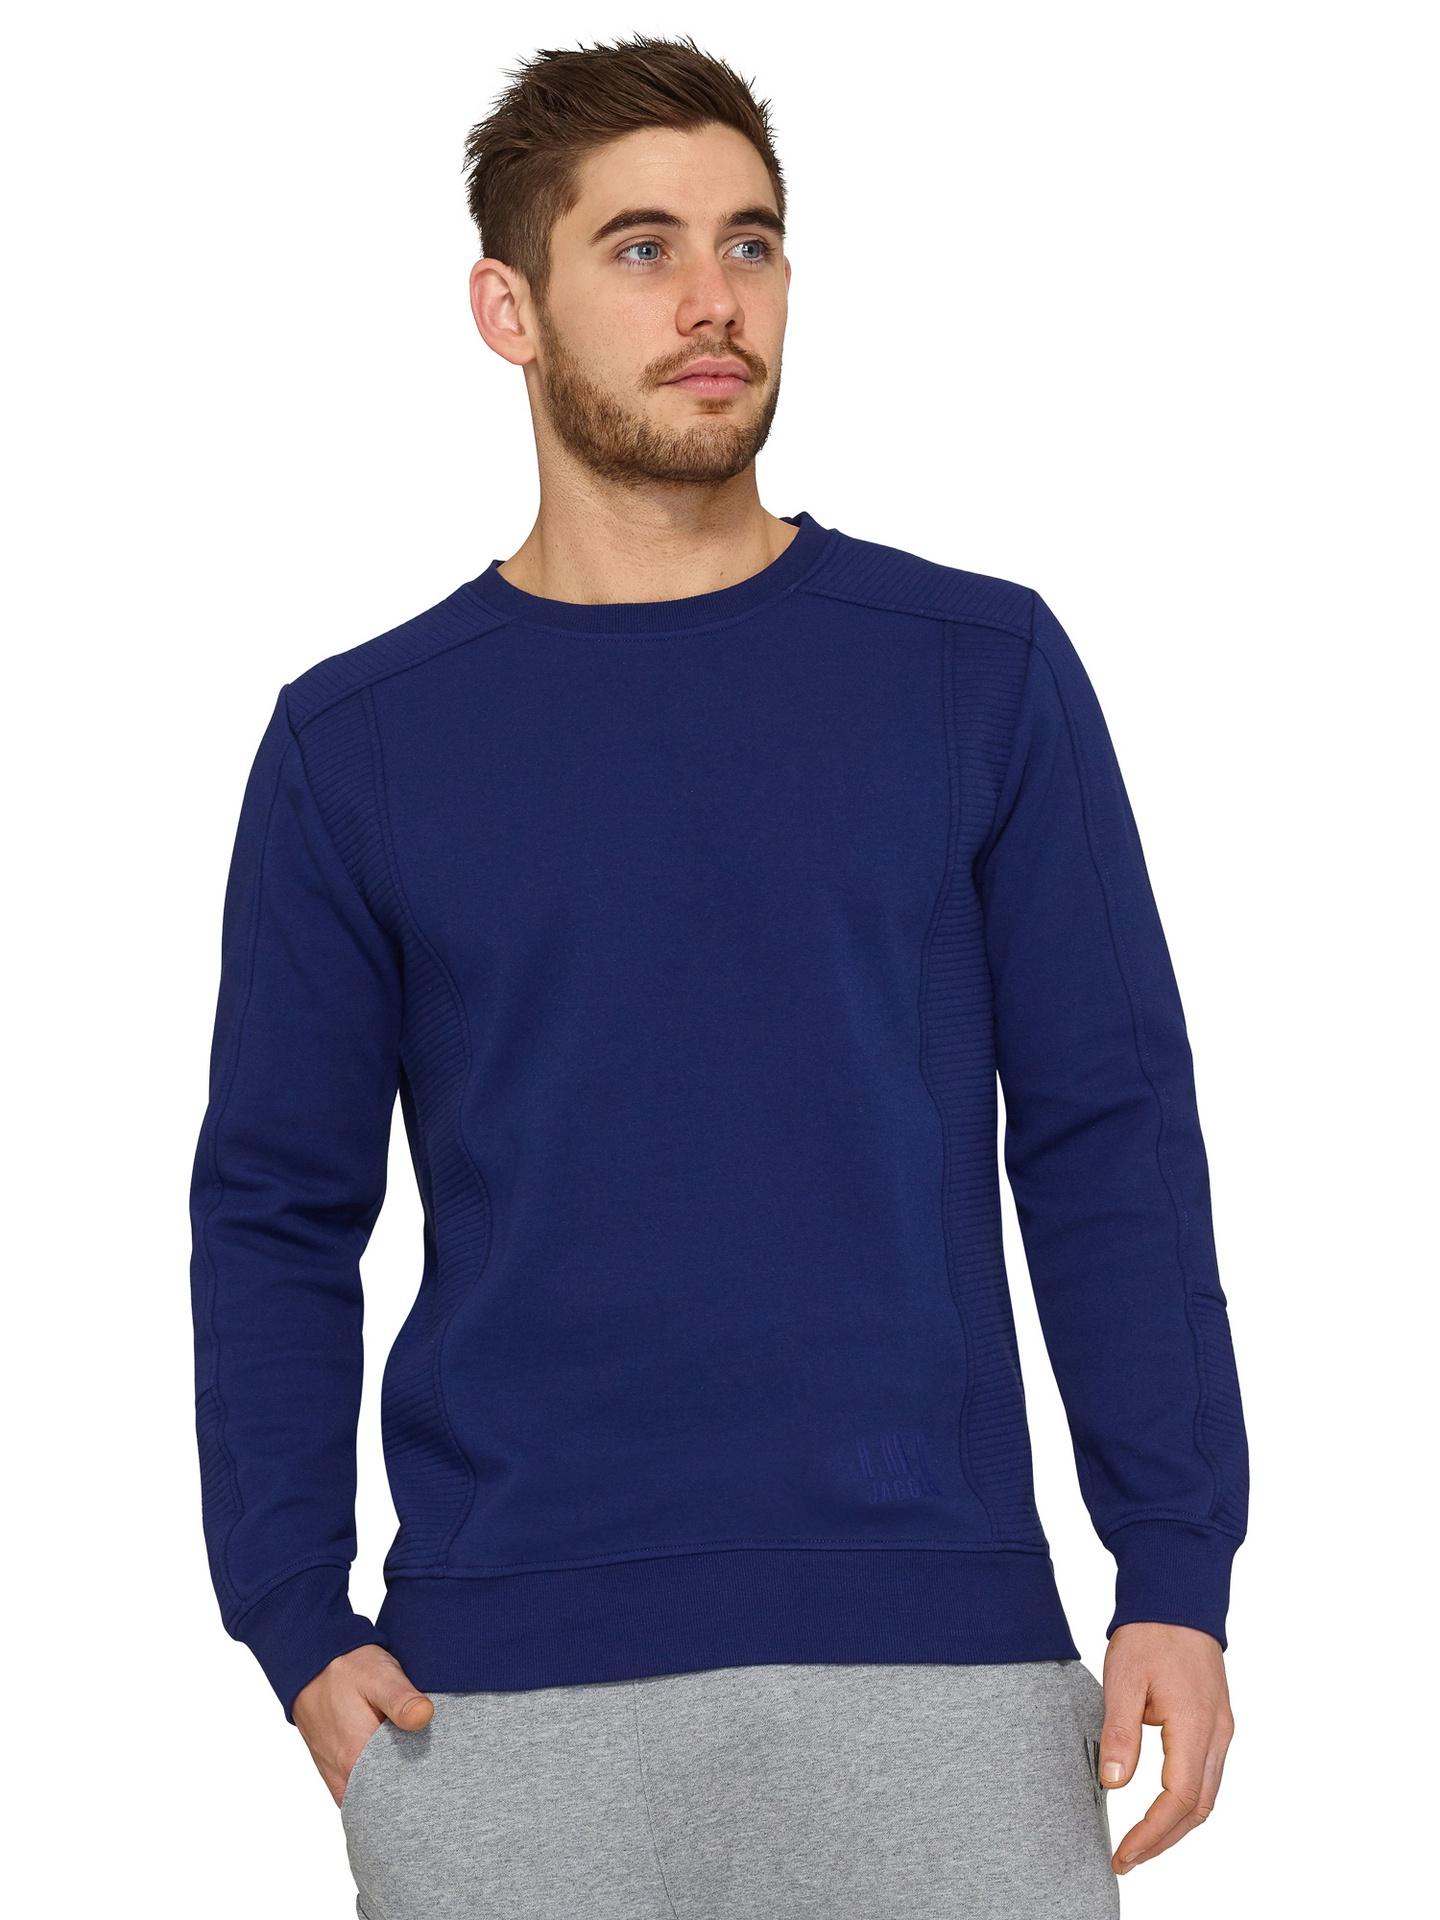 apex textured sweater